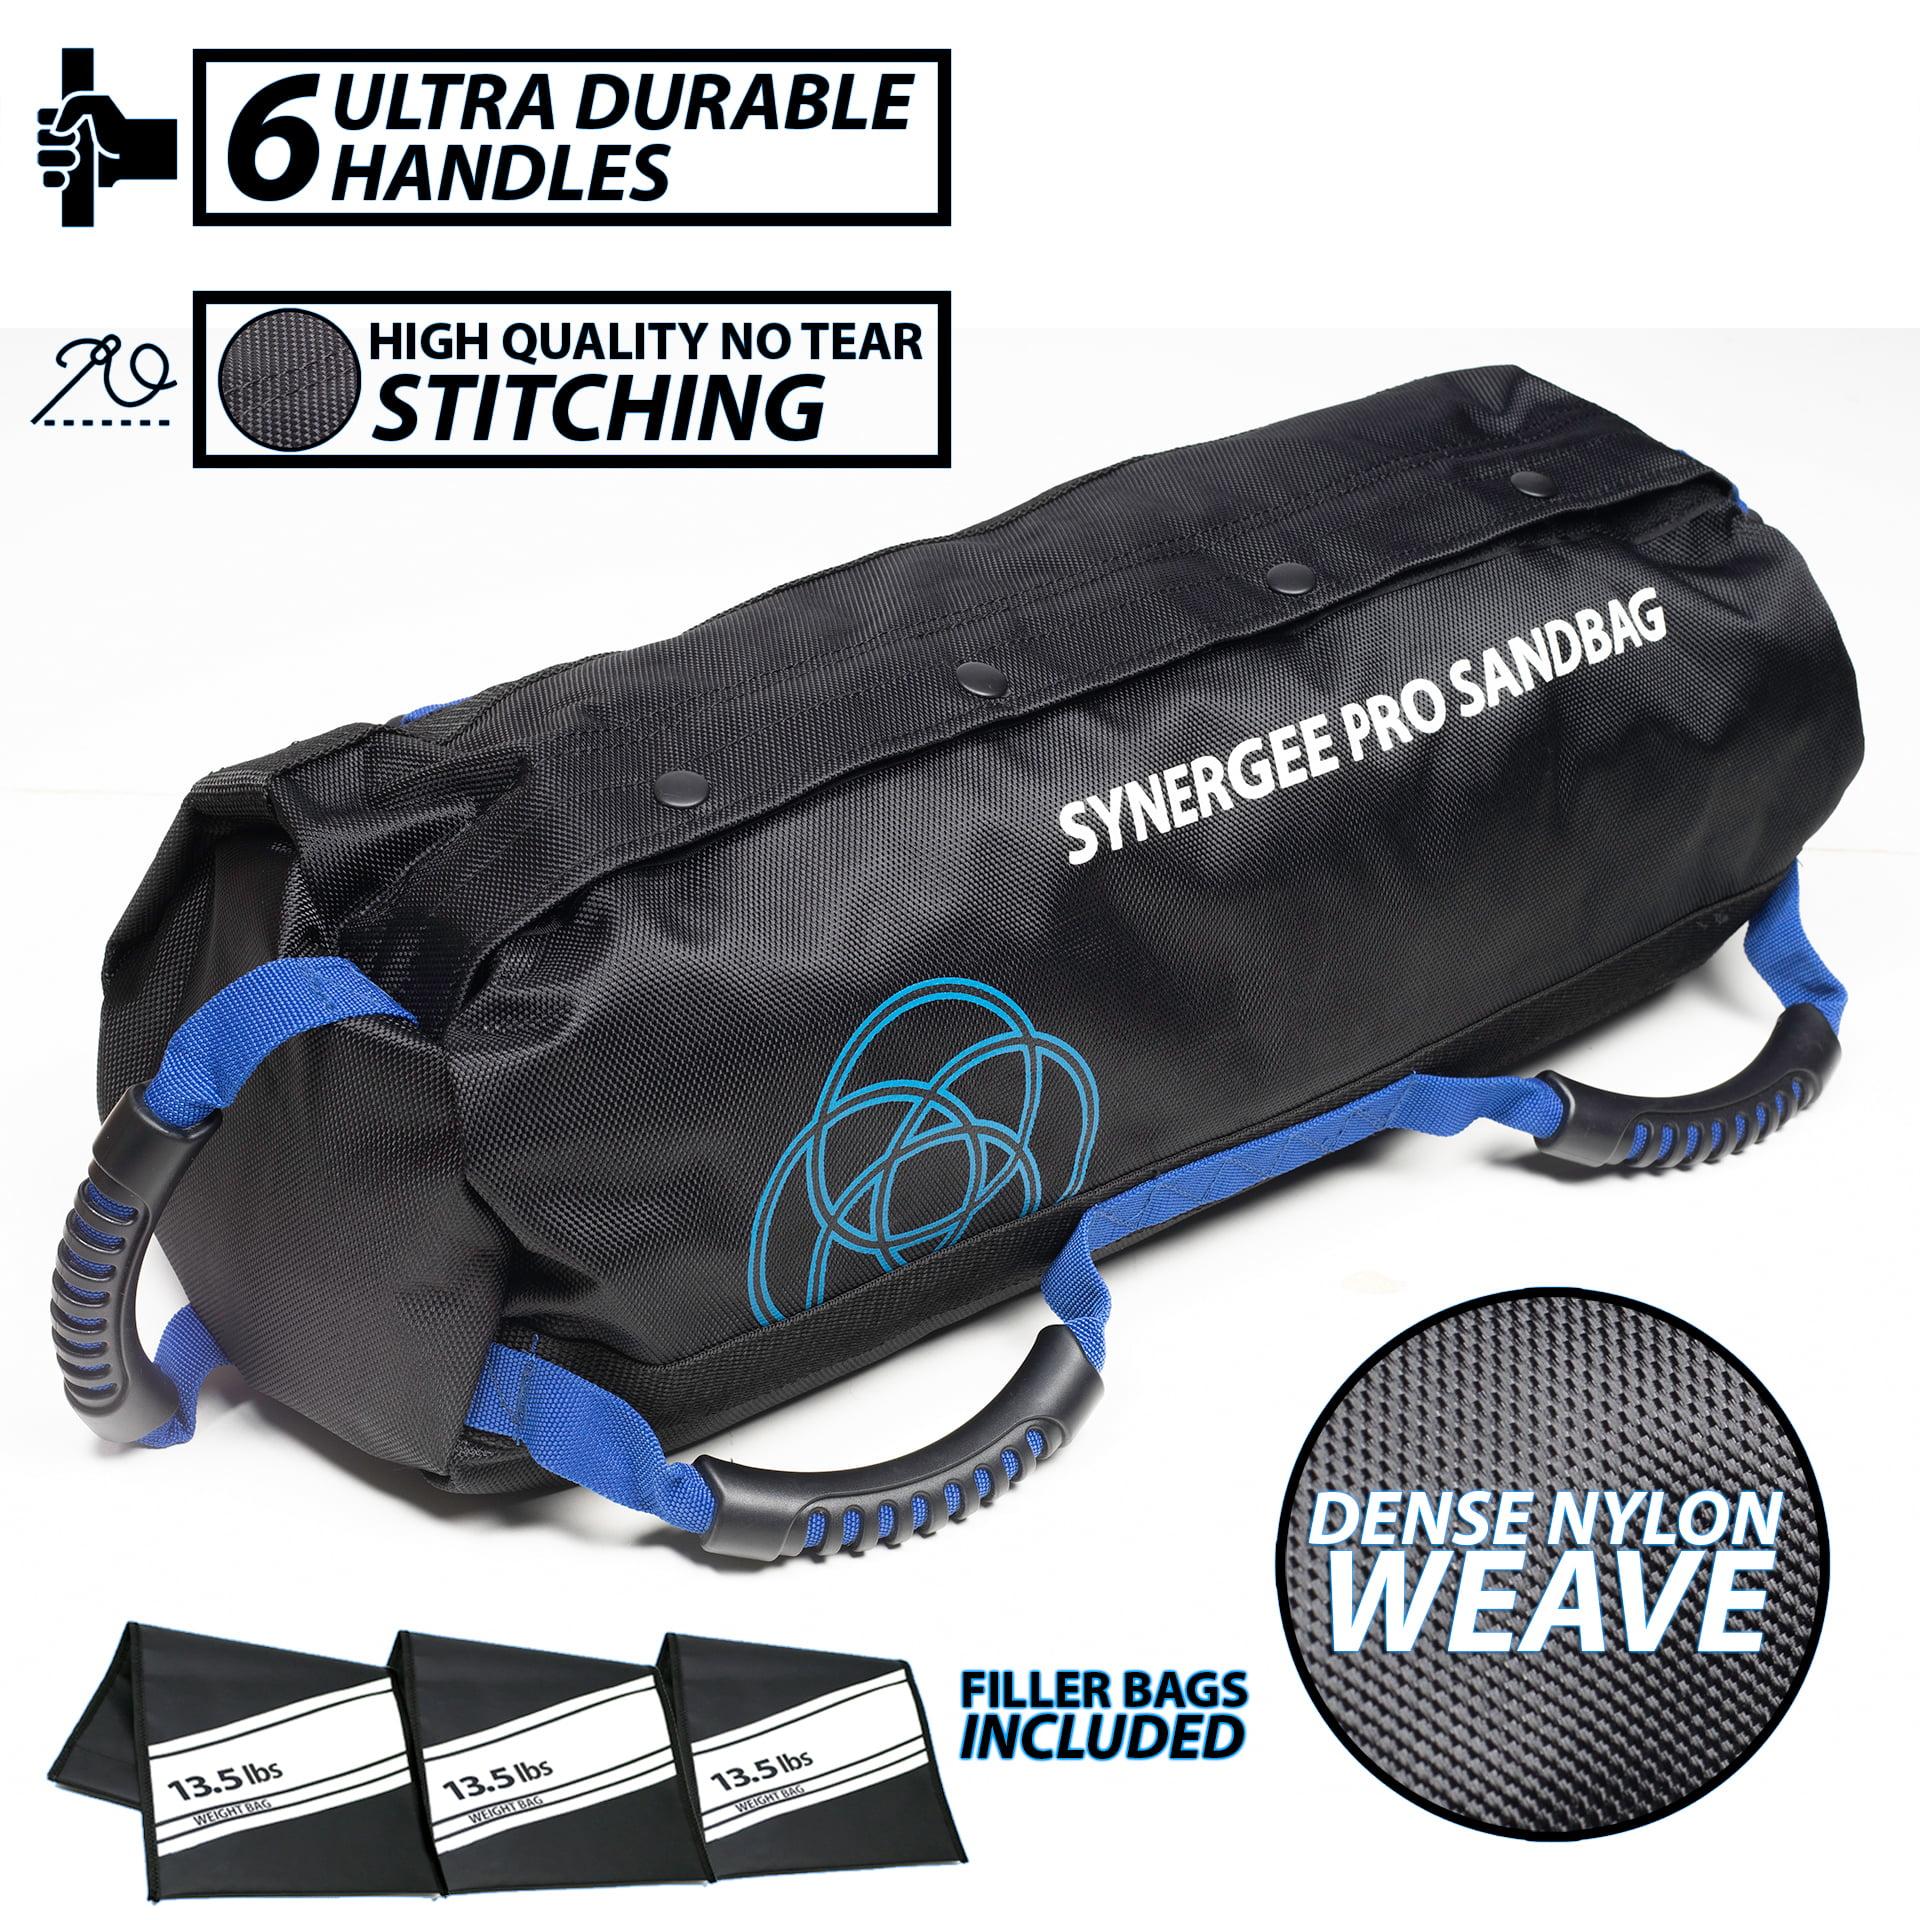 Synergee Adjustable Fitness Sandbag From 10lbs To 100lbs Adjustable Sandbags With Filler Bags Heavy Duty Weight Bag Walmart Com Walmart Com